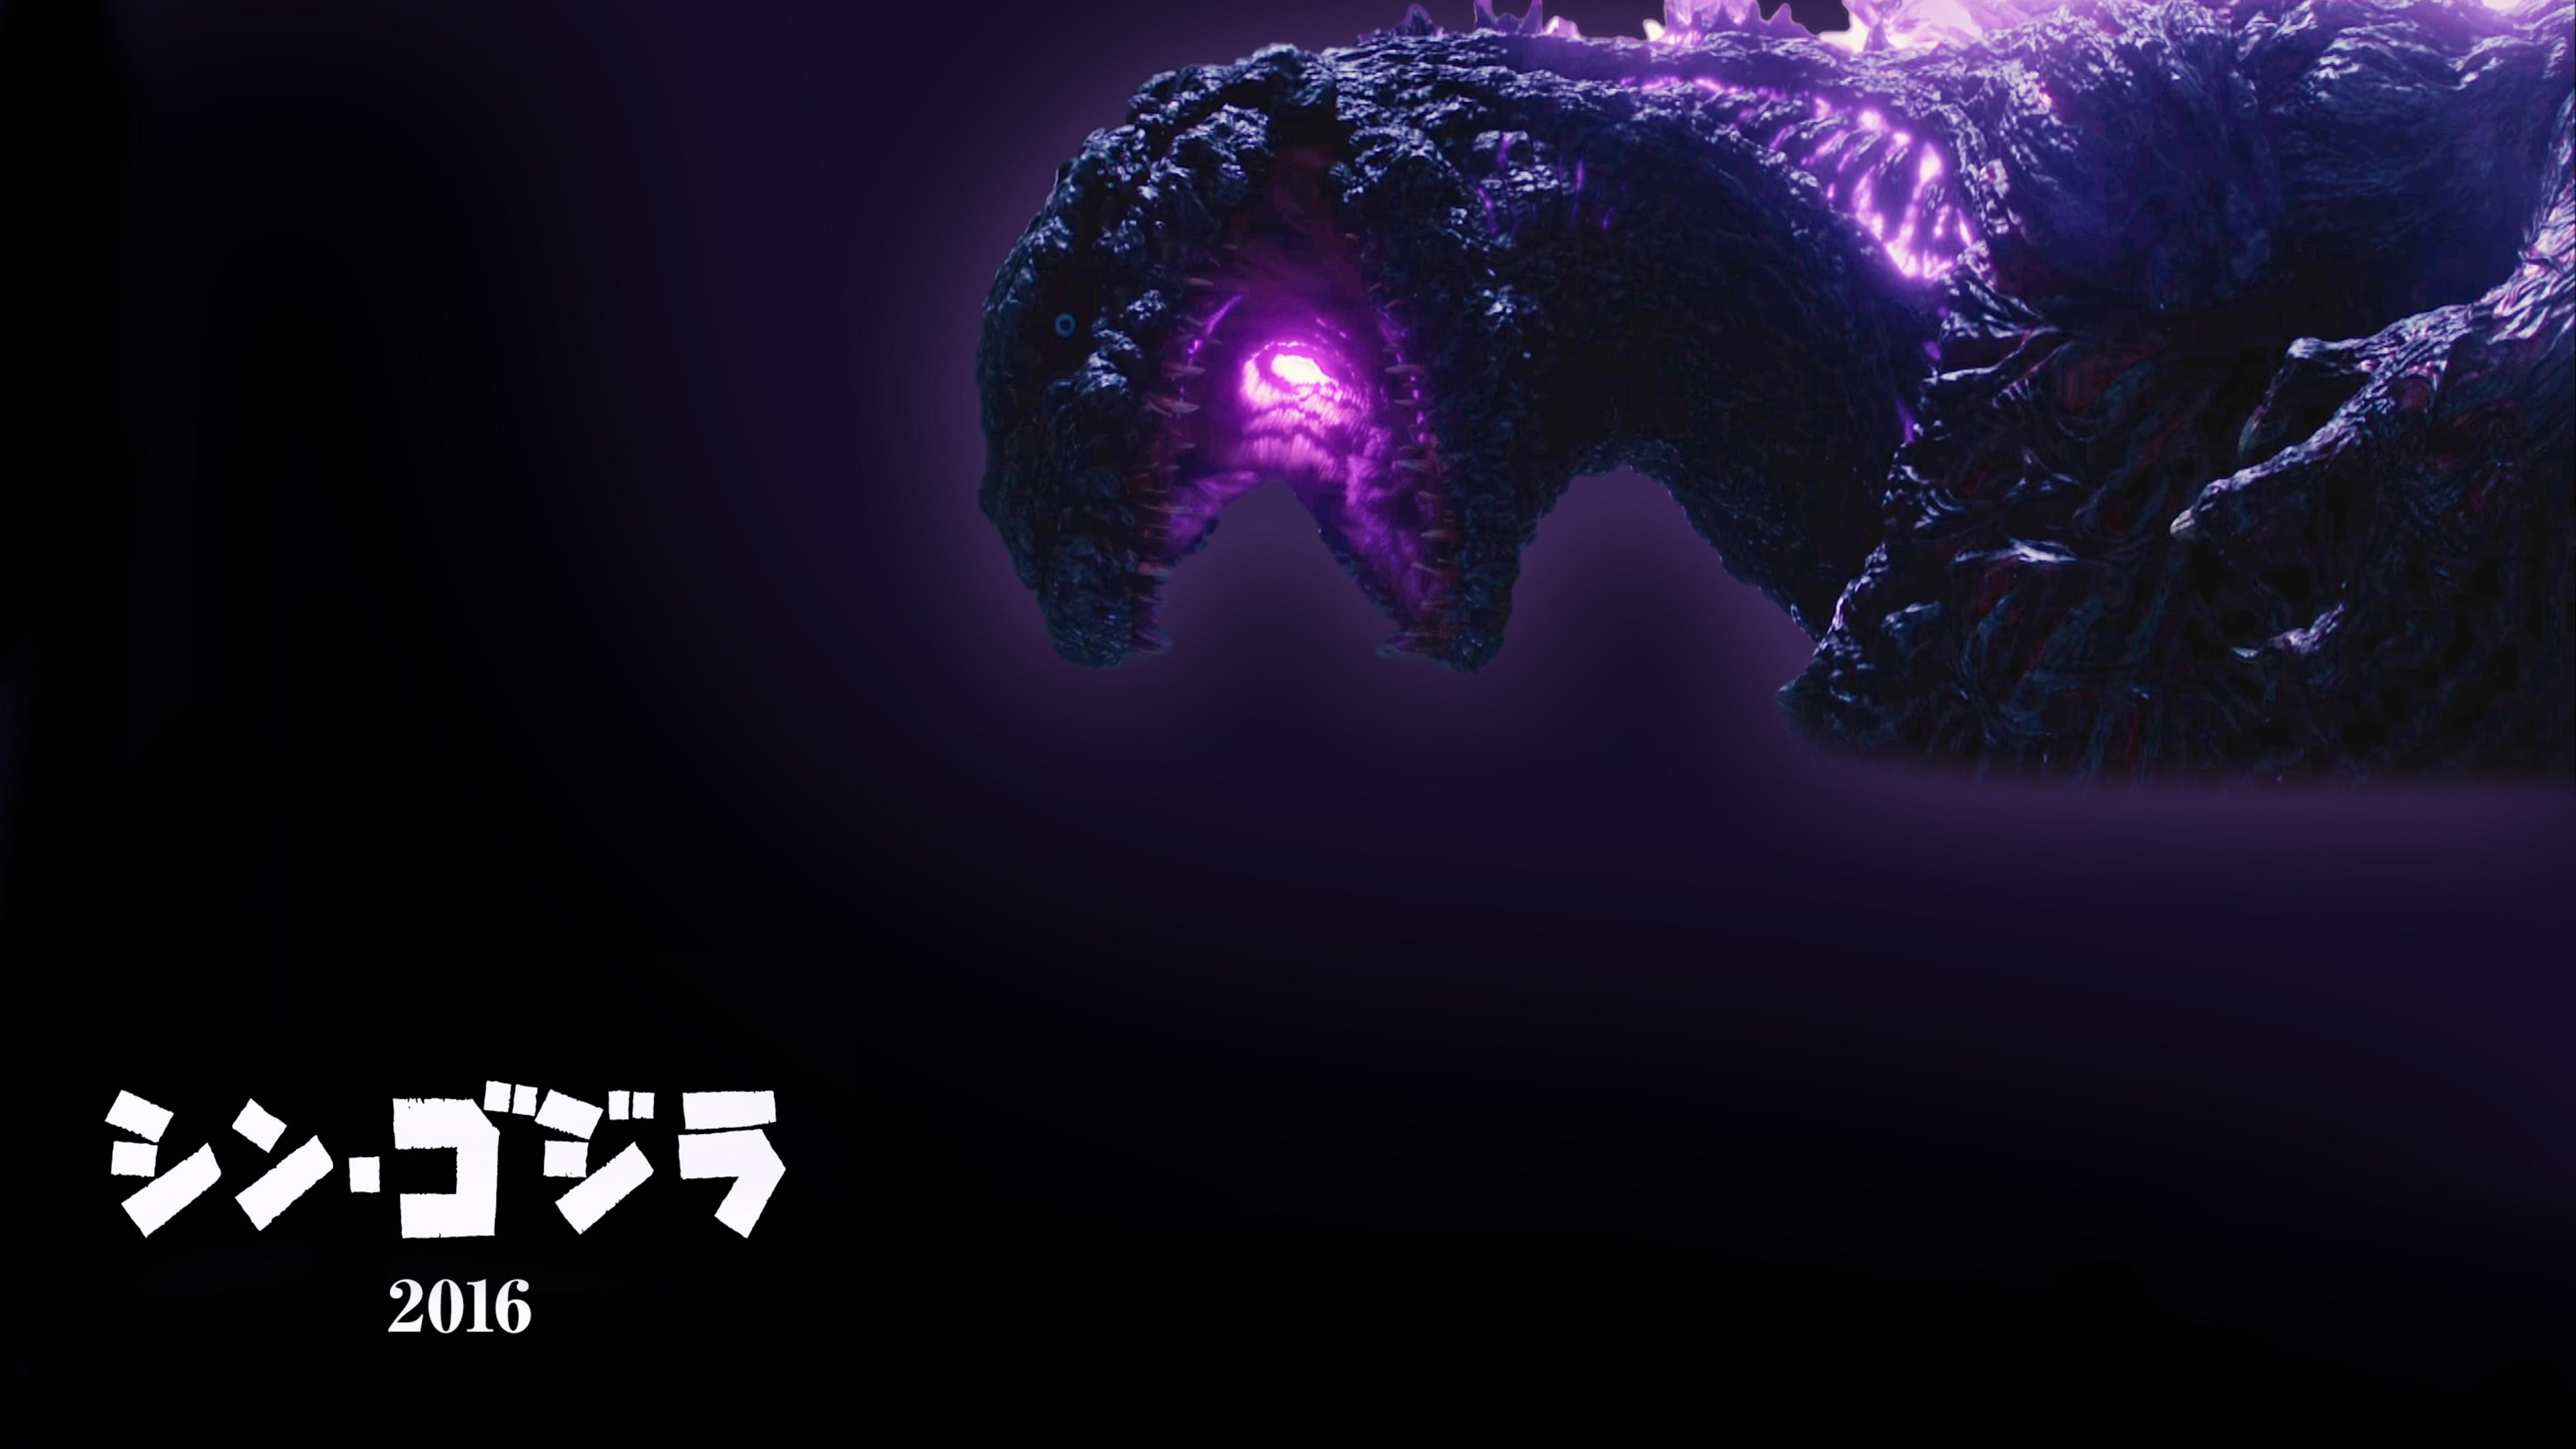 Created this desktop background featuring Shin Gojira preparing 3840x2160